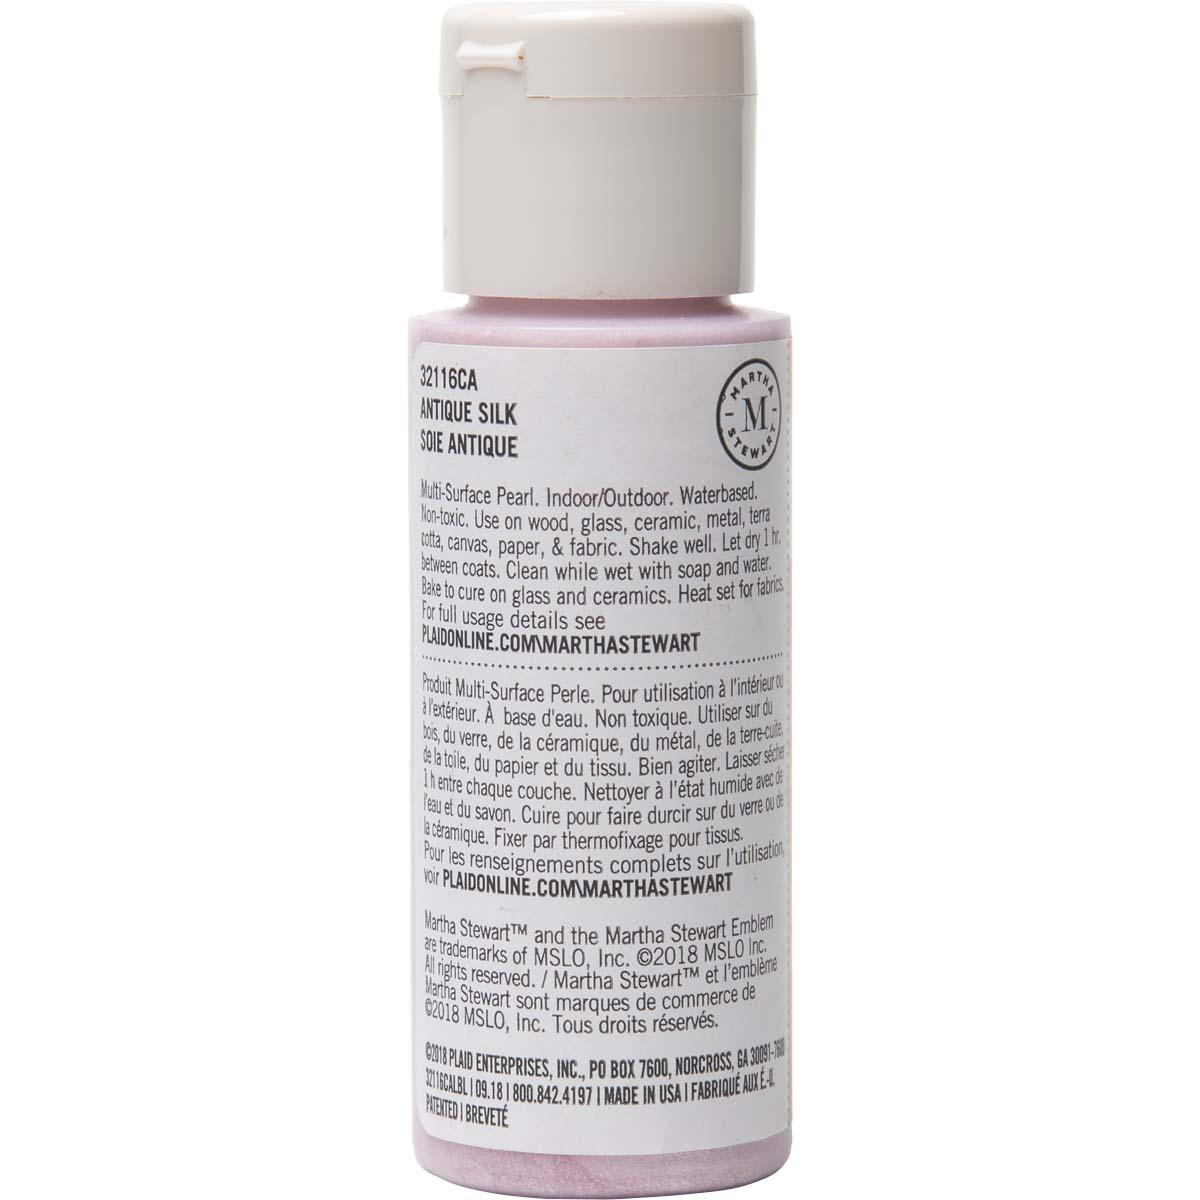 Martha Stewart ® Multi-Surface Pearl Acrylic Craft Paint - Antique Silk, 2 oz. - 32116CA